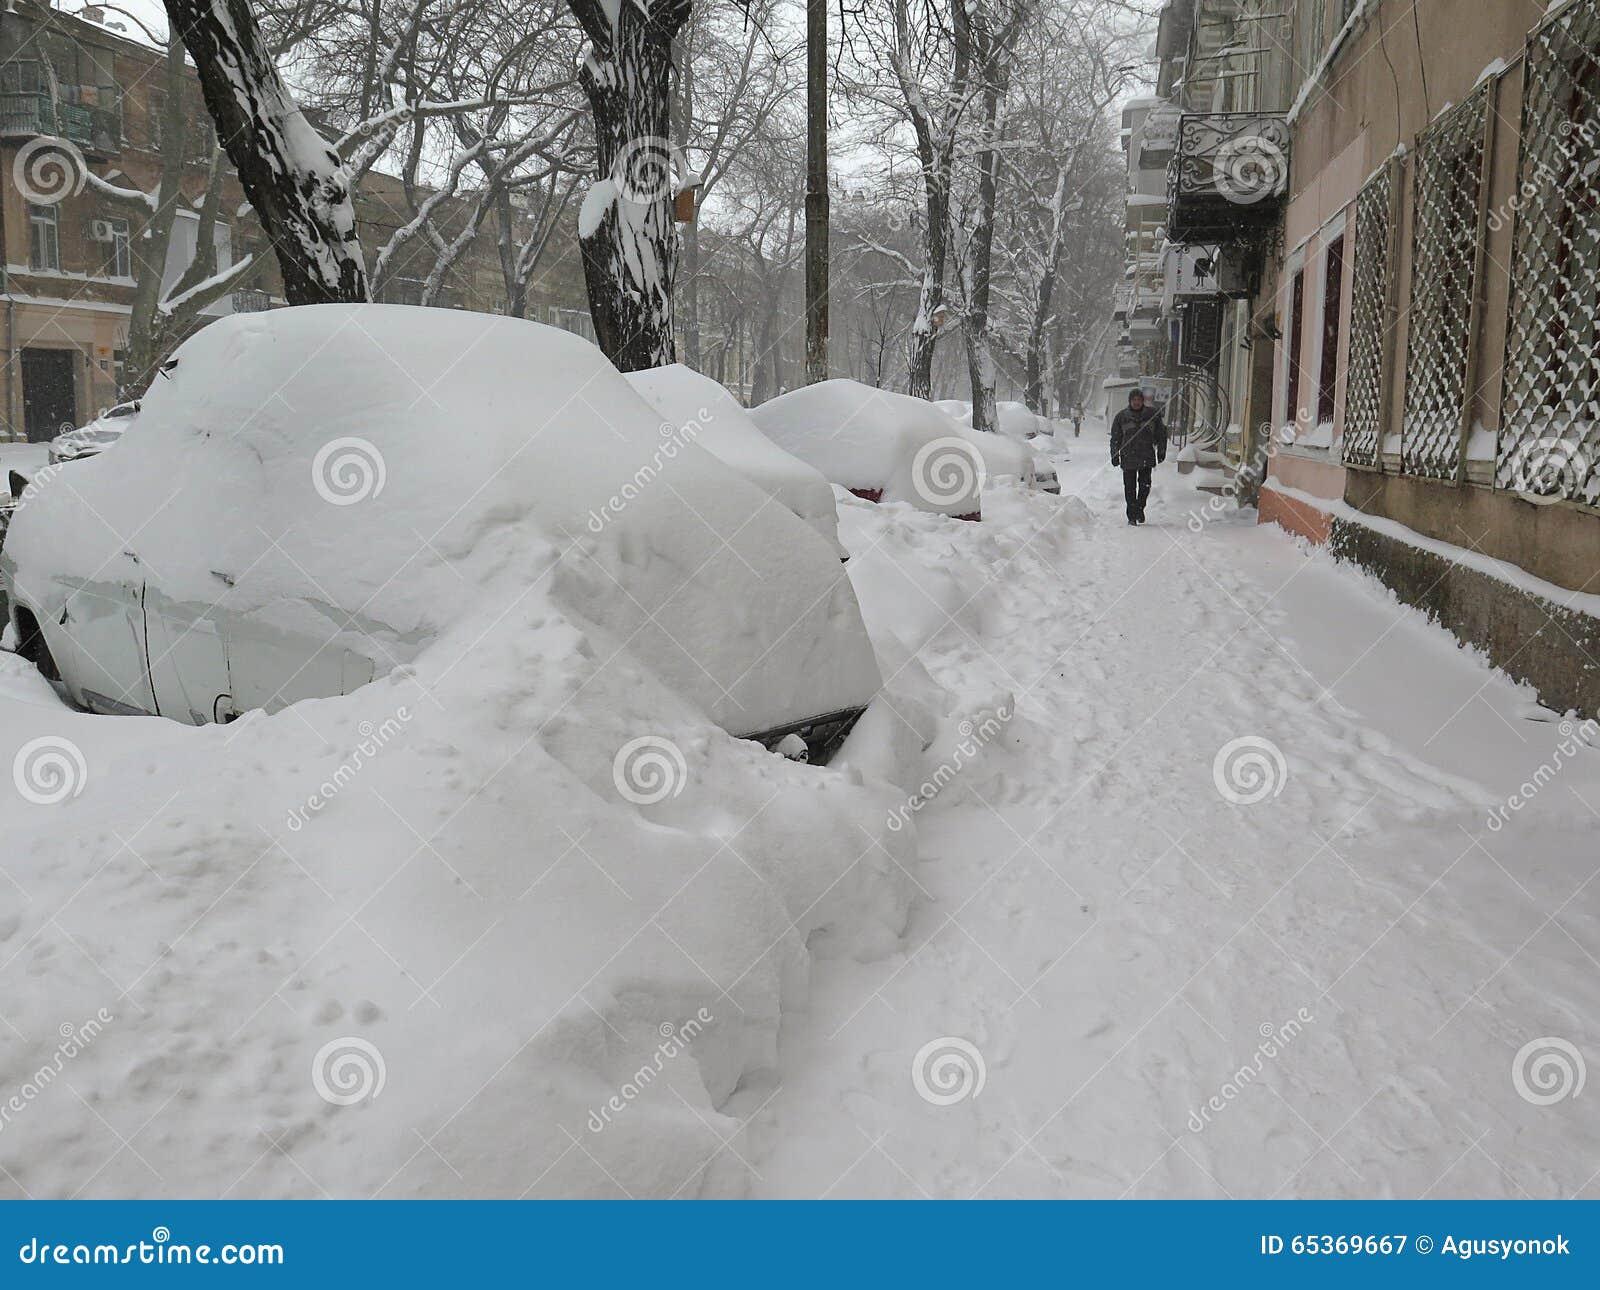 January  Natural Disasters